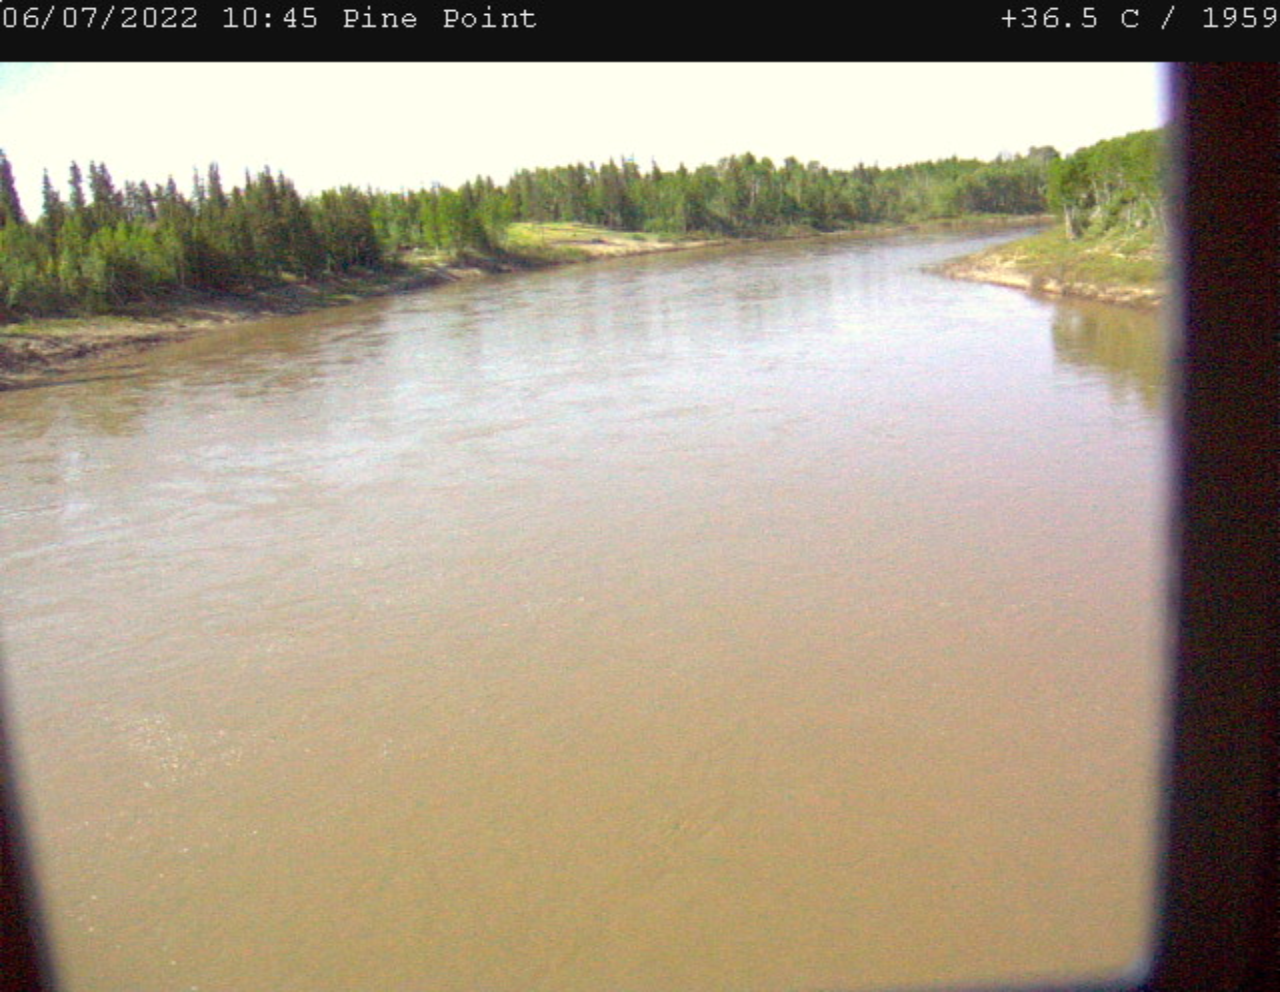 Pine Point Camera